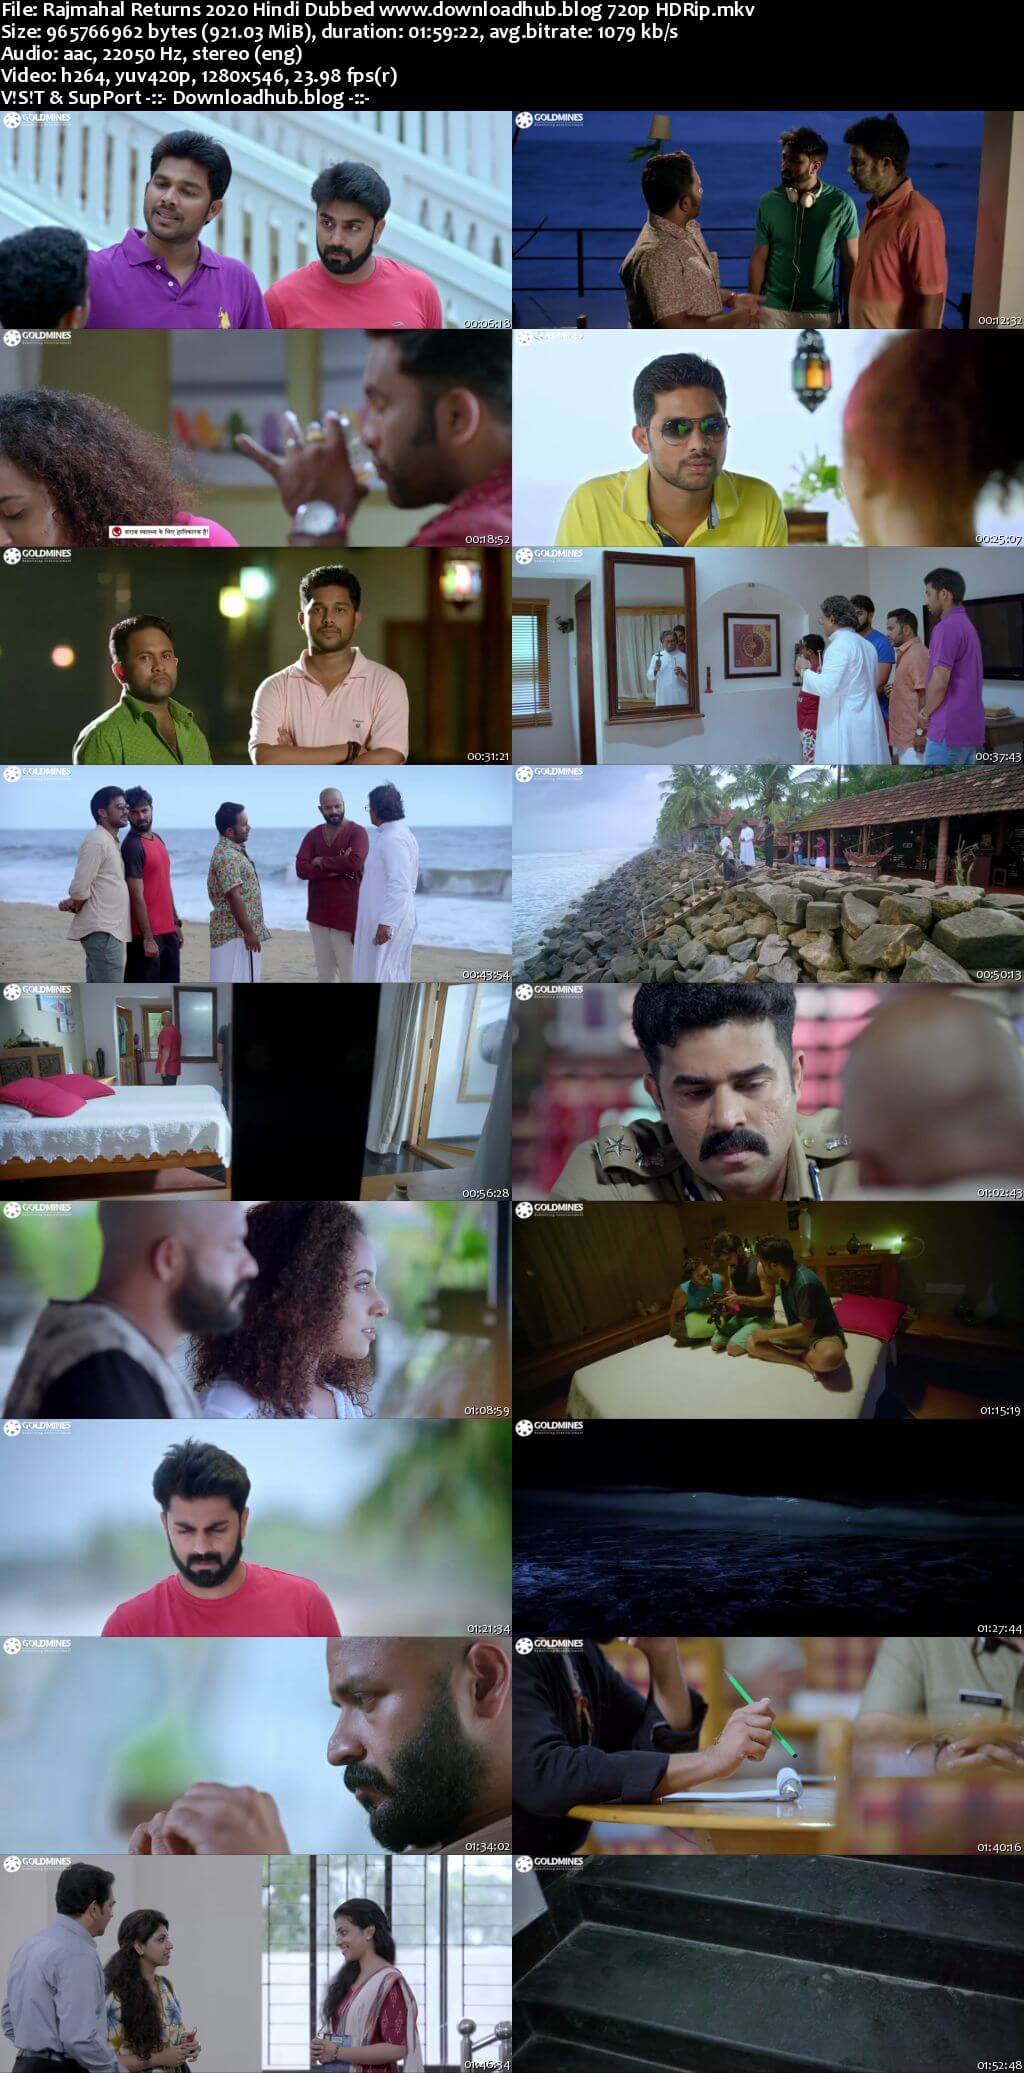 Rajmahal Returns 2020 Hindi Dubbed 720p HDRip x264